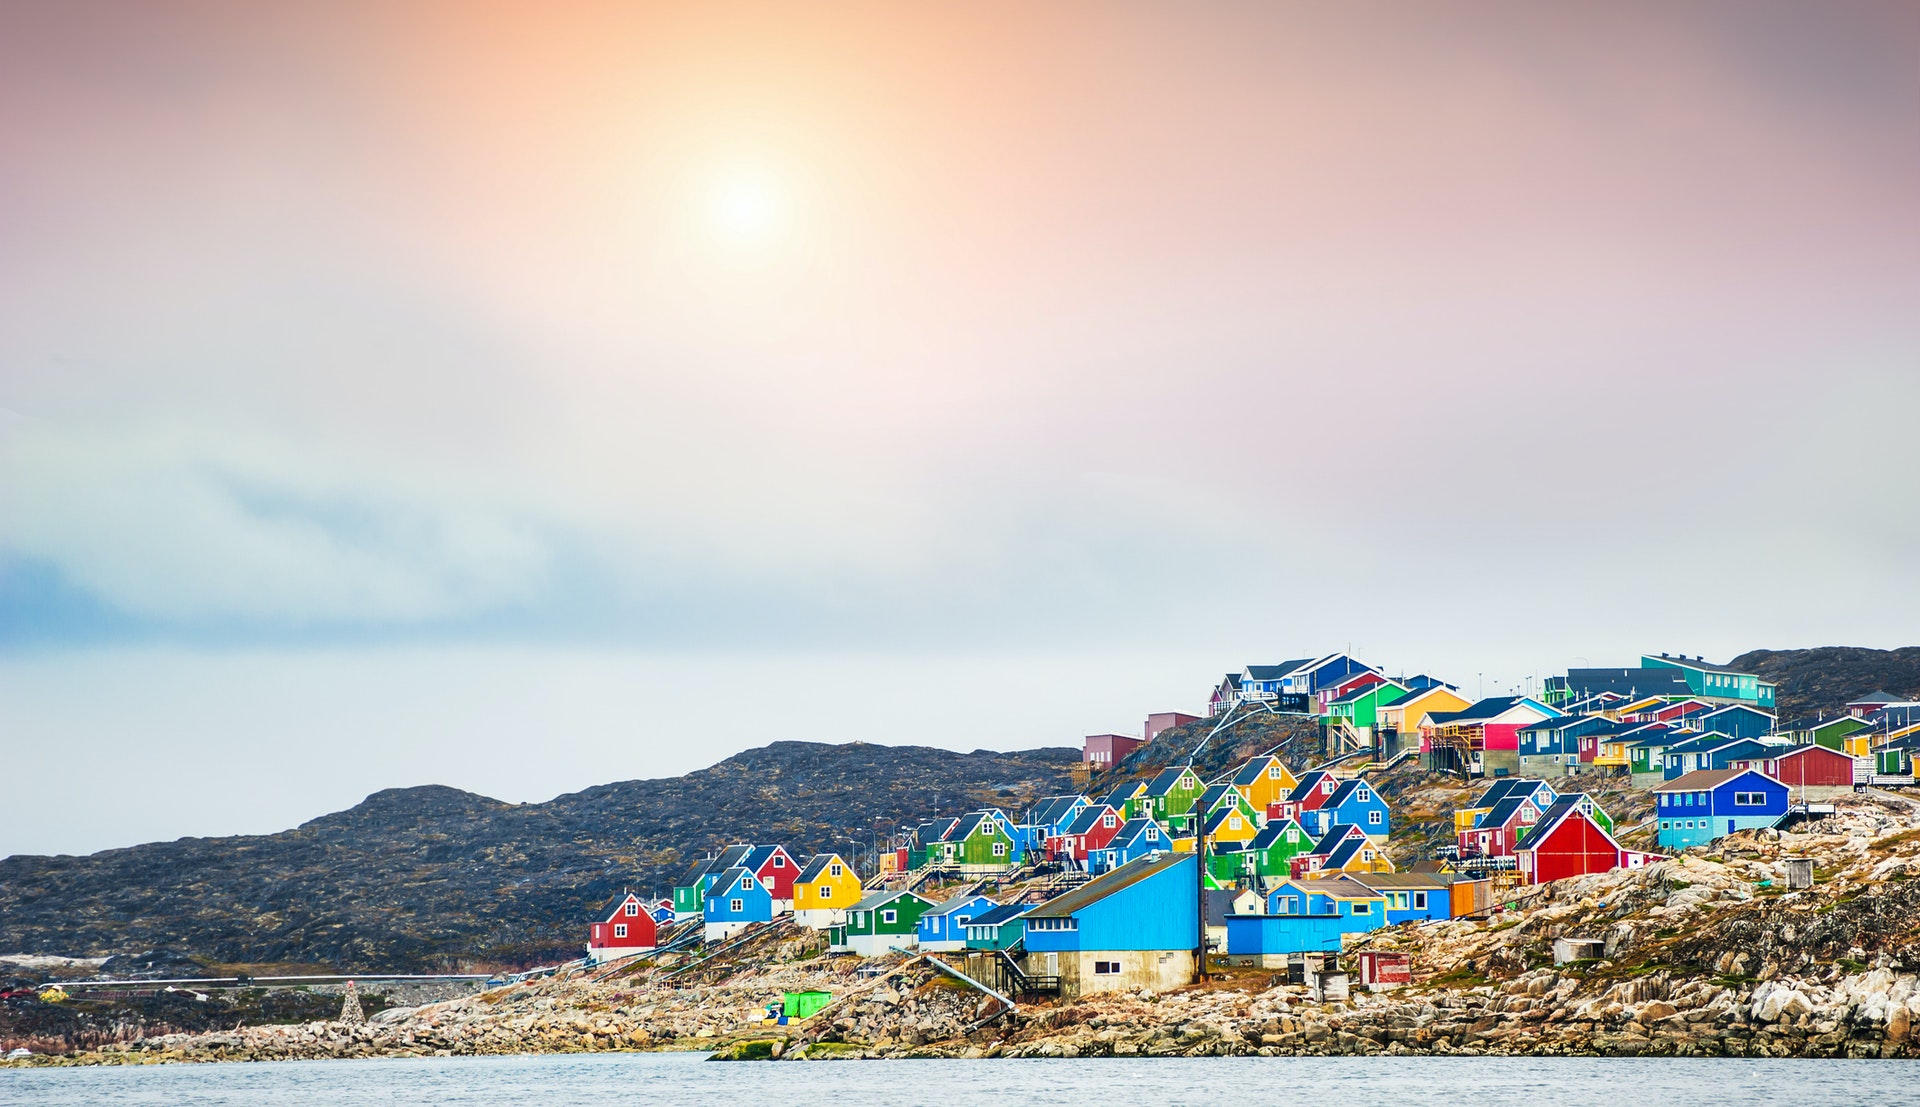 Grønland i midnattssol © Olga Gavrilova, Getty Images